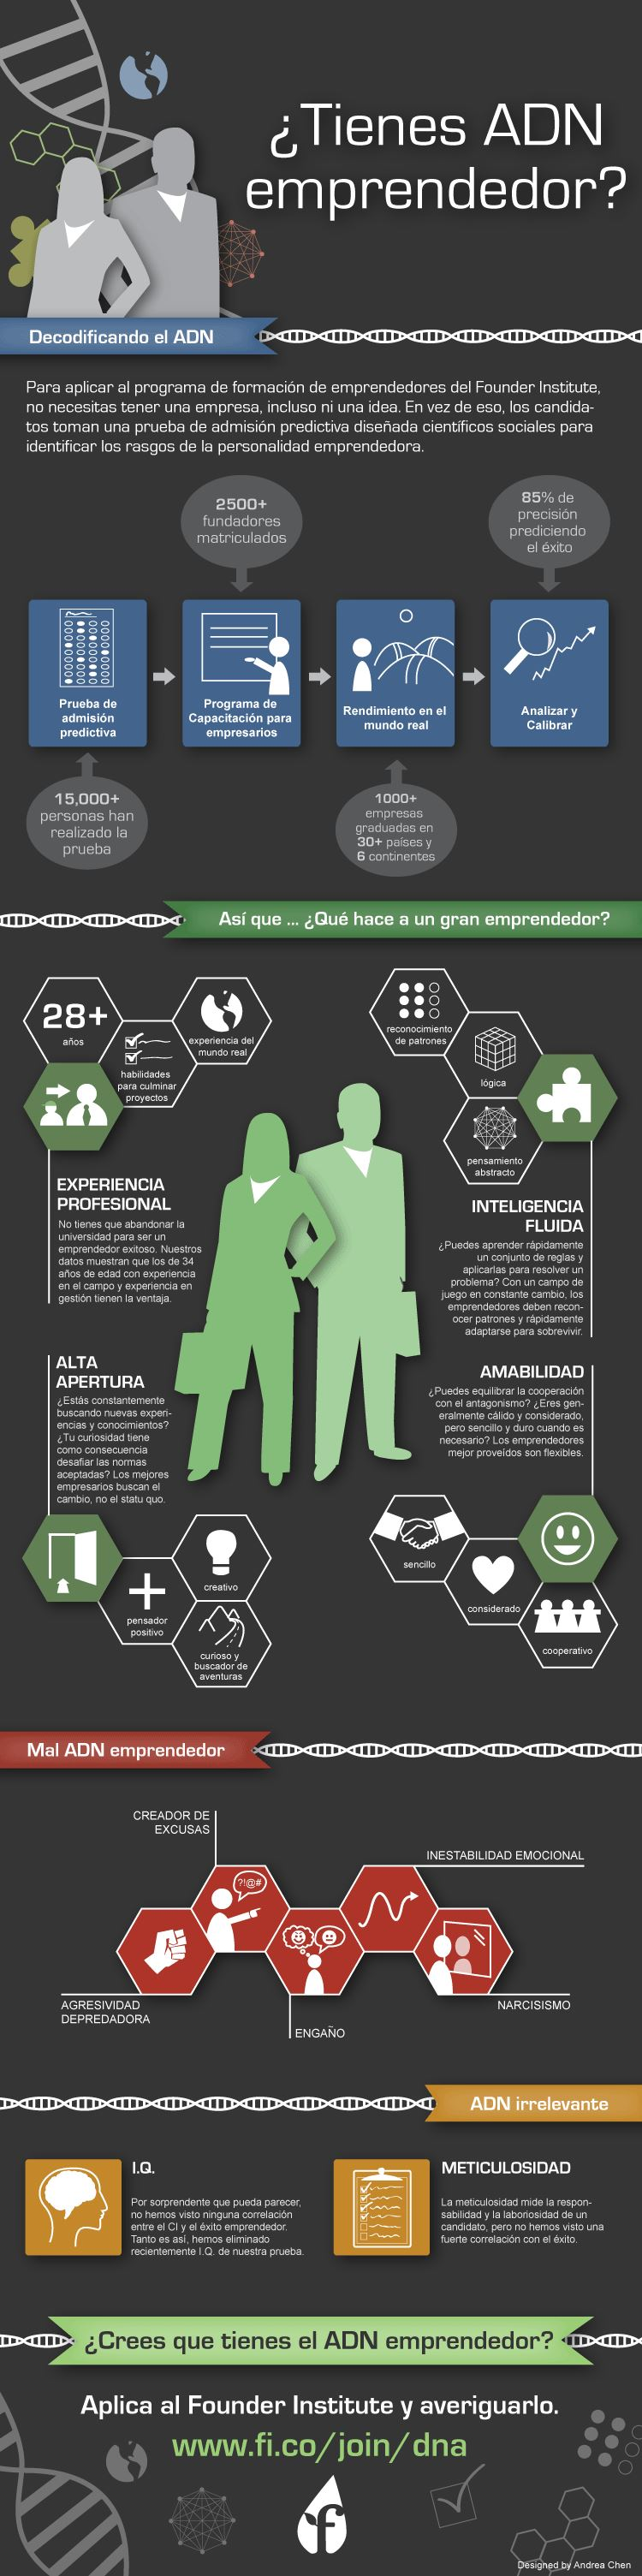 entrepreneur_info_colored_small_spanish